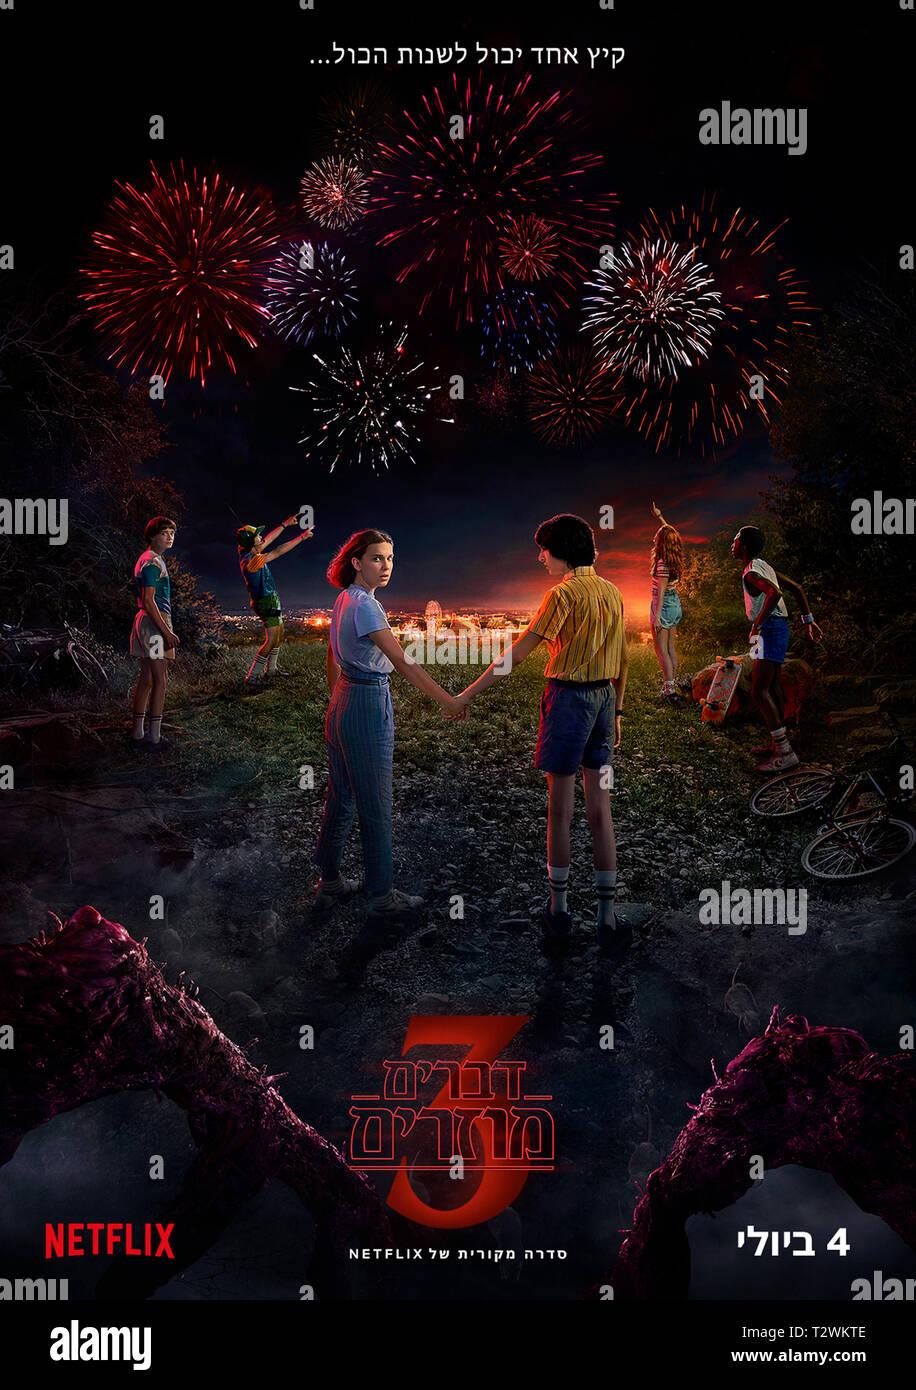 STRANGER THINGS 2016- serie TV creee par Matt Duffer et Ross Duffer affiche israelienne de la saison 3 Prod DB © Netflix - 21 Laps Entertainment / DR - Stock Image